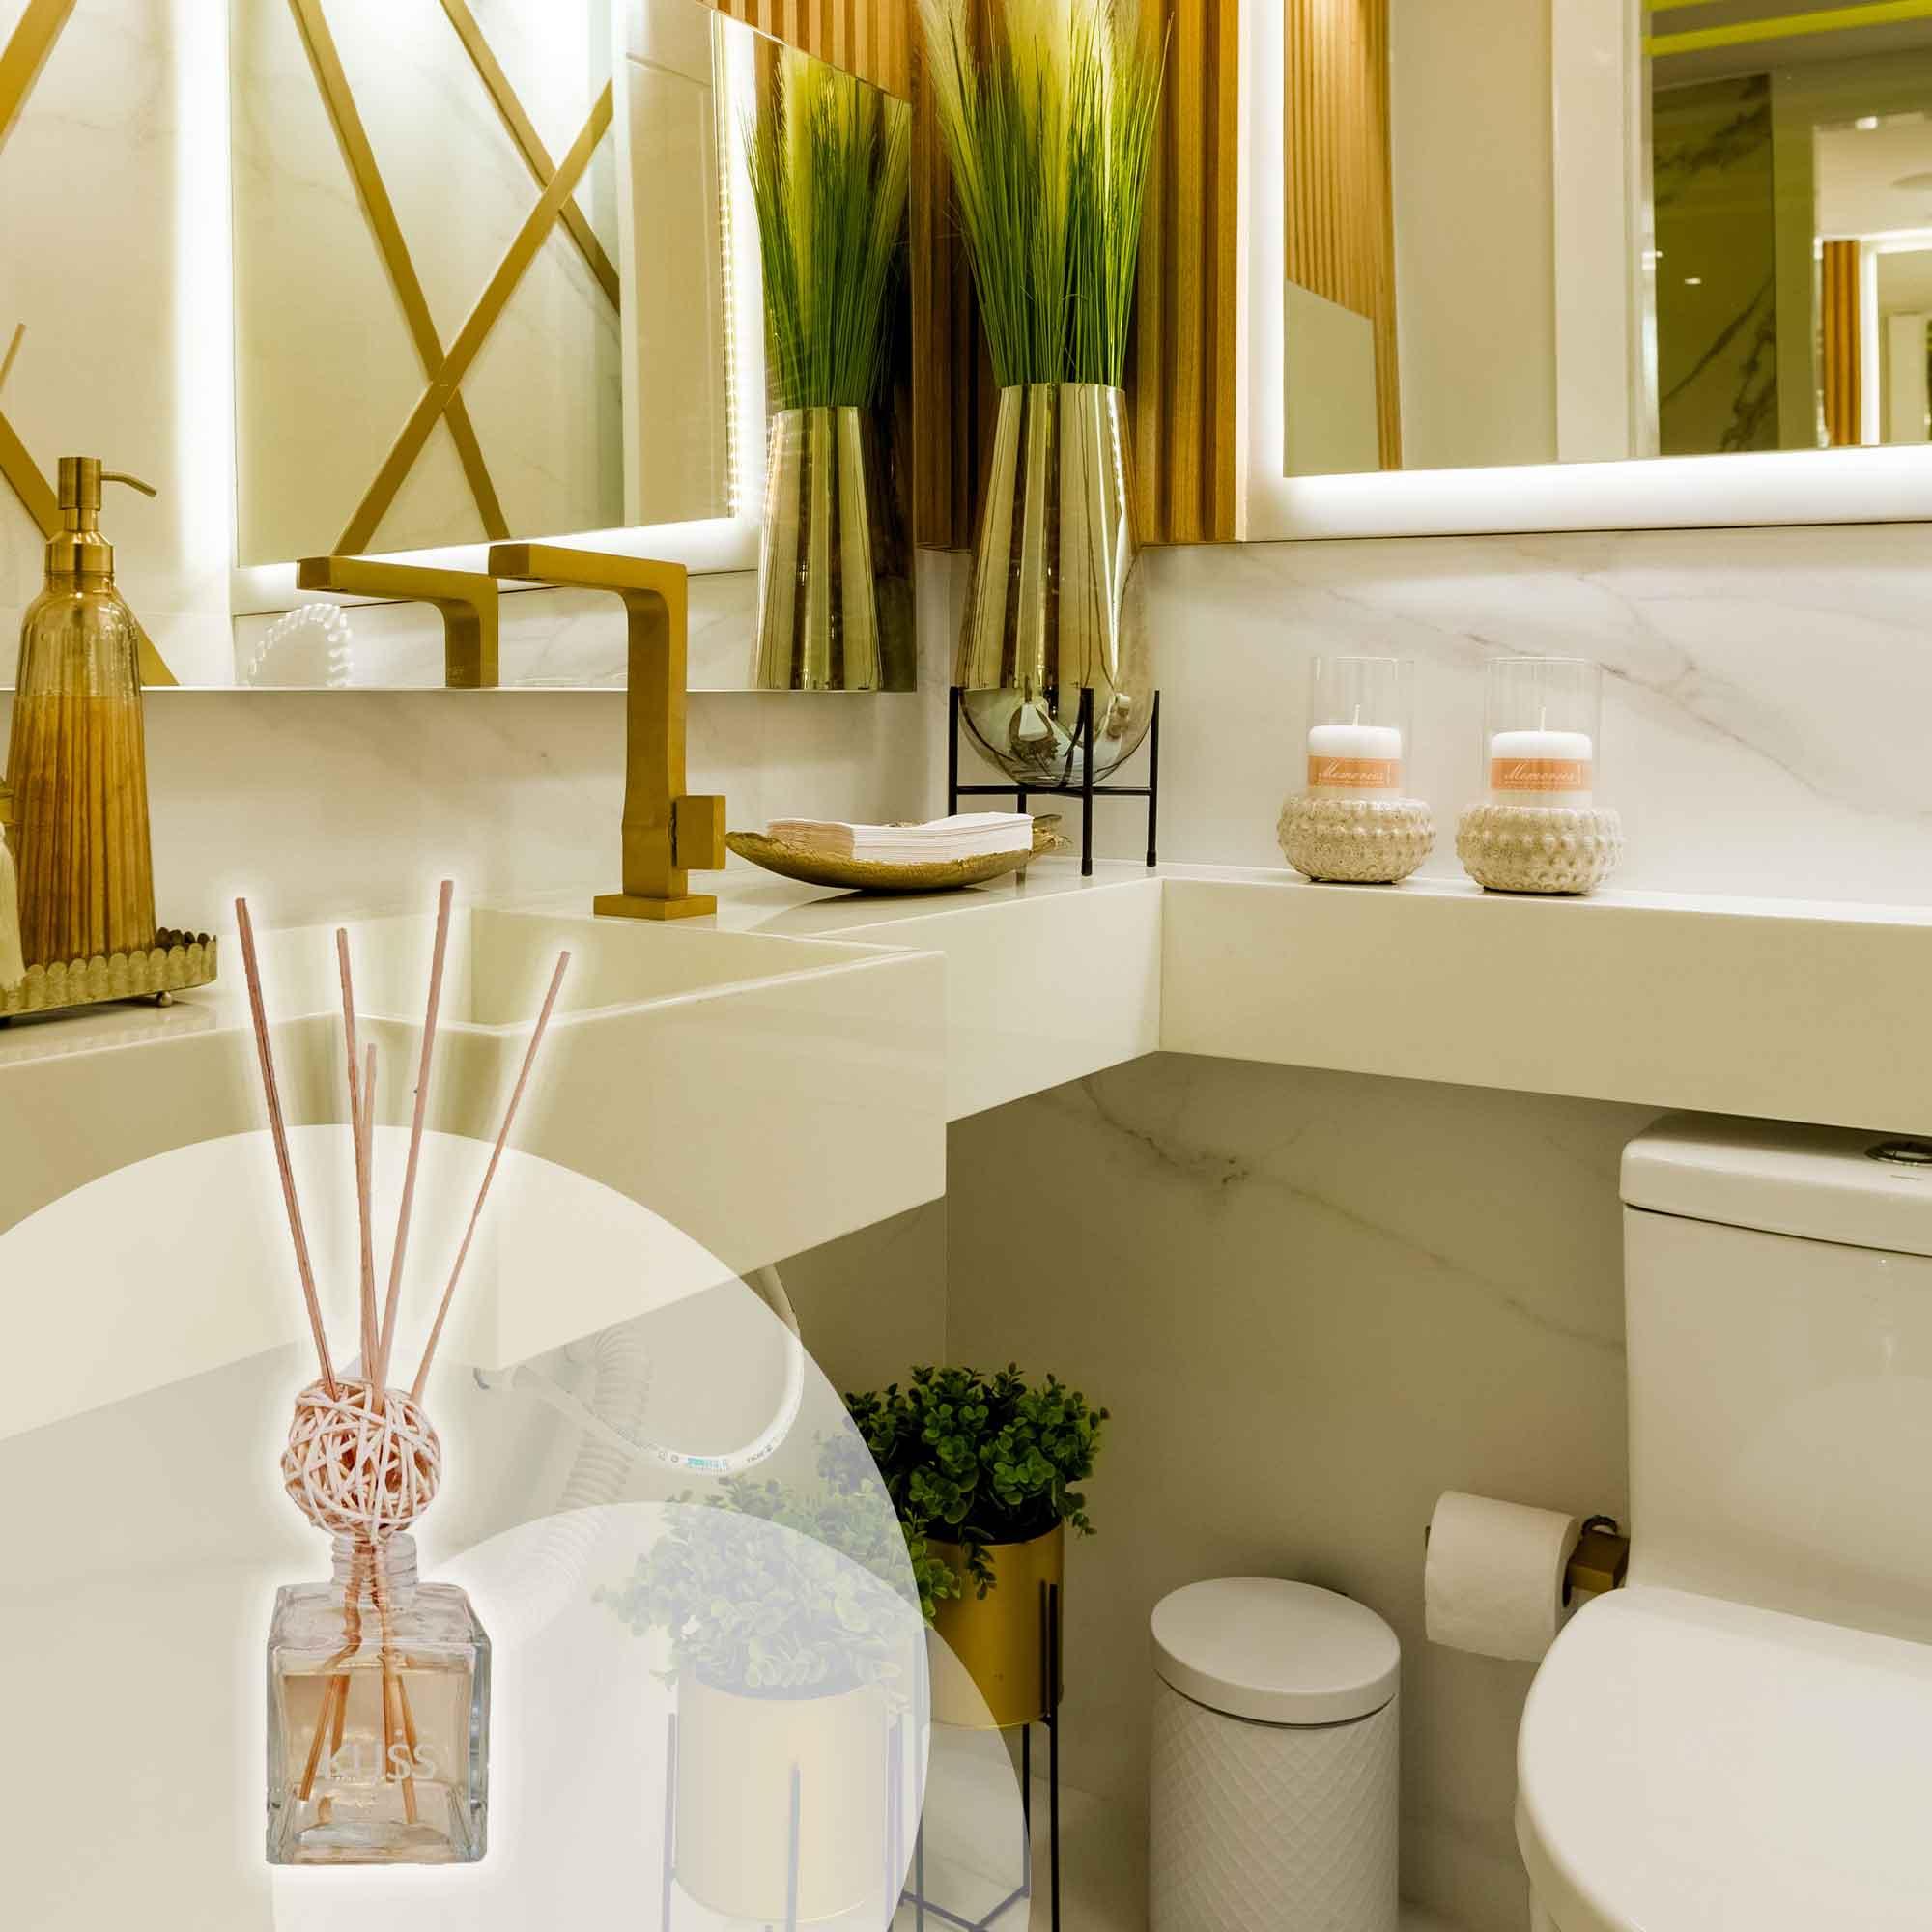 kuss-essentials-Bathroom